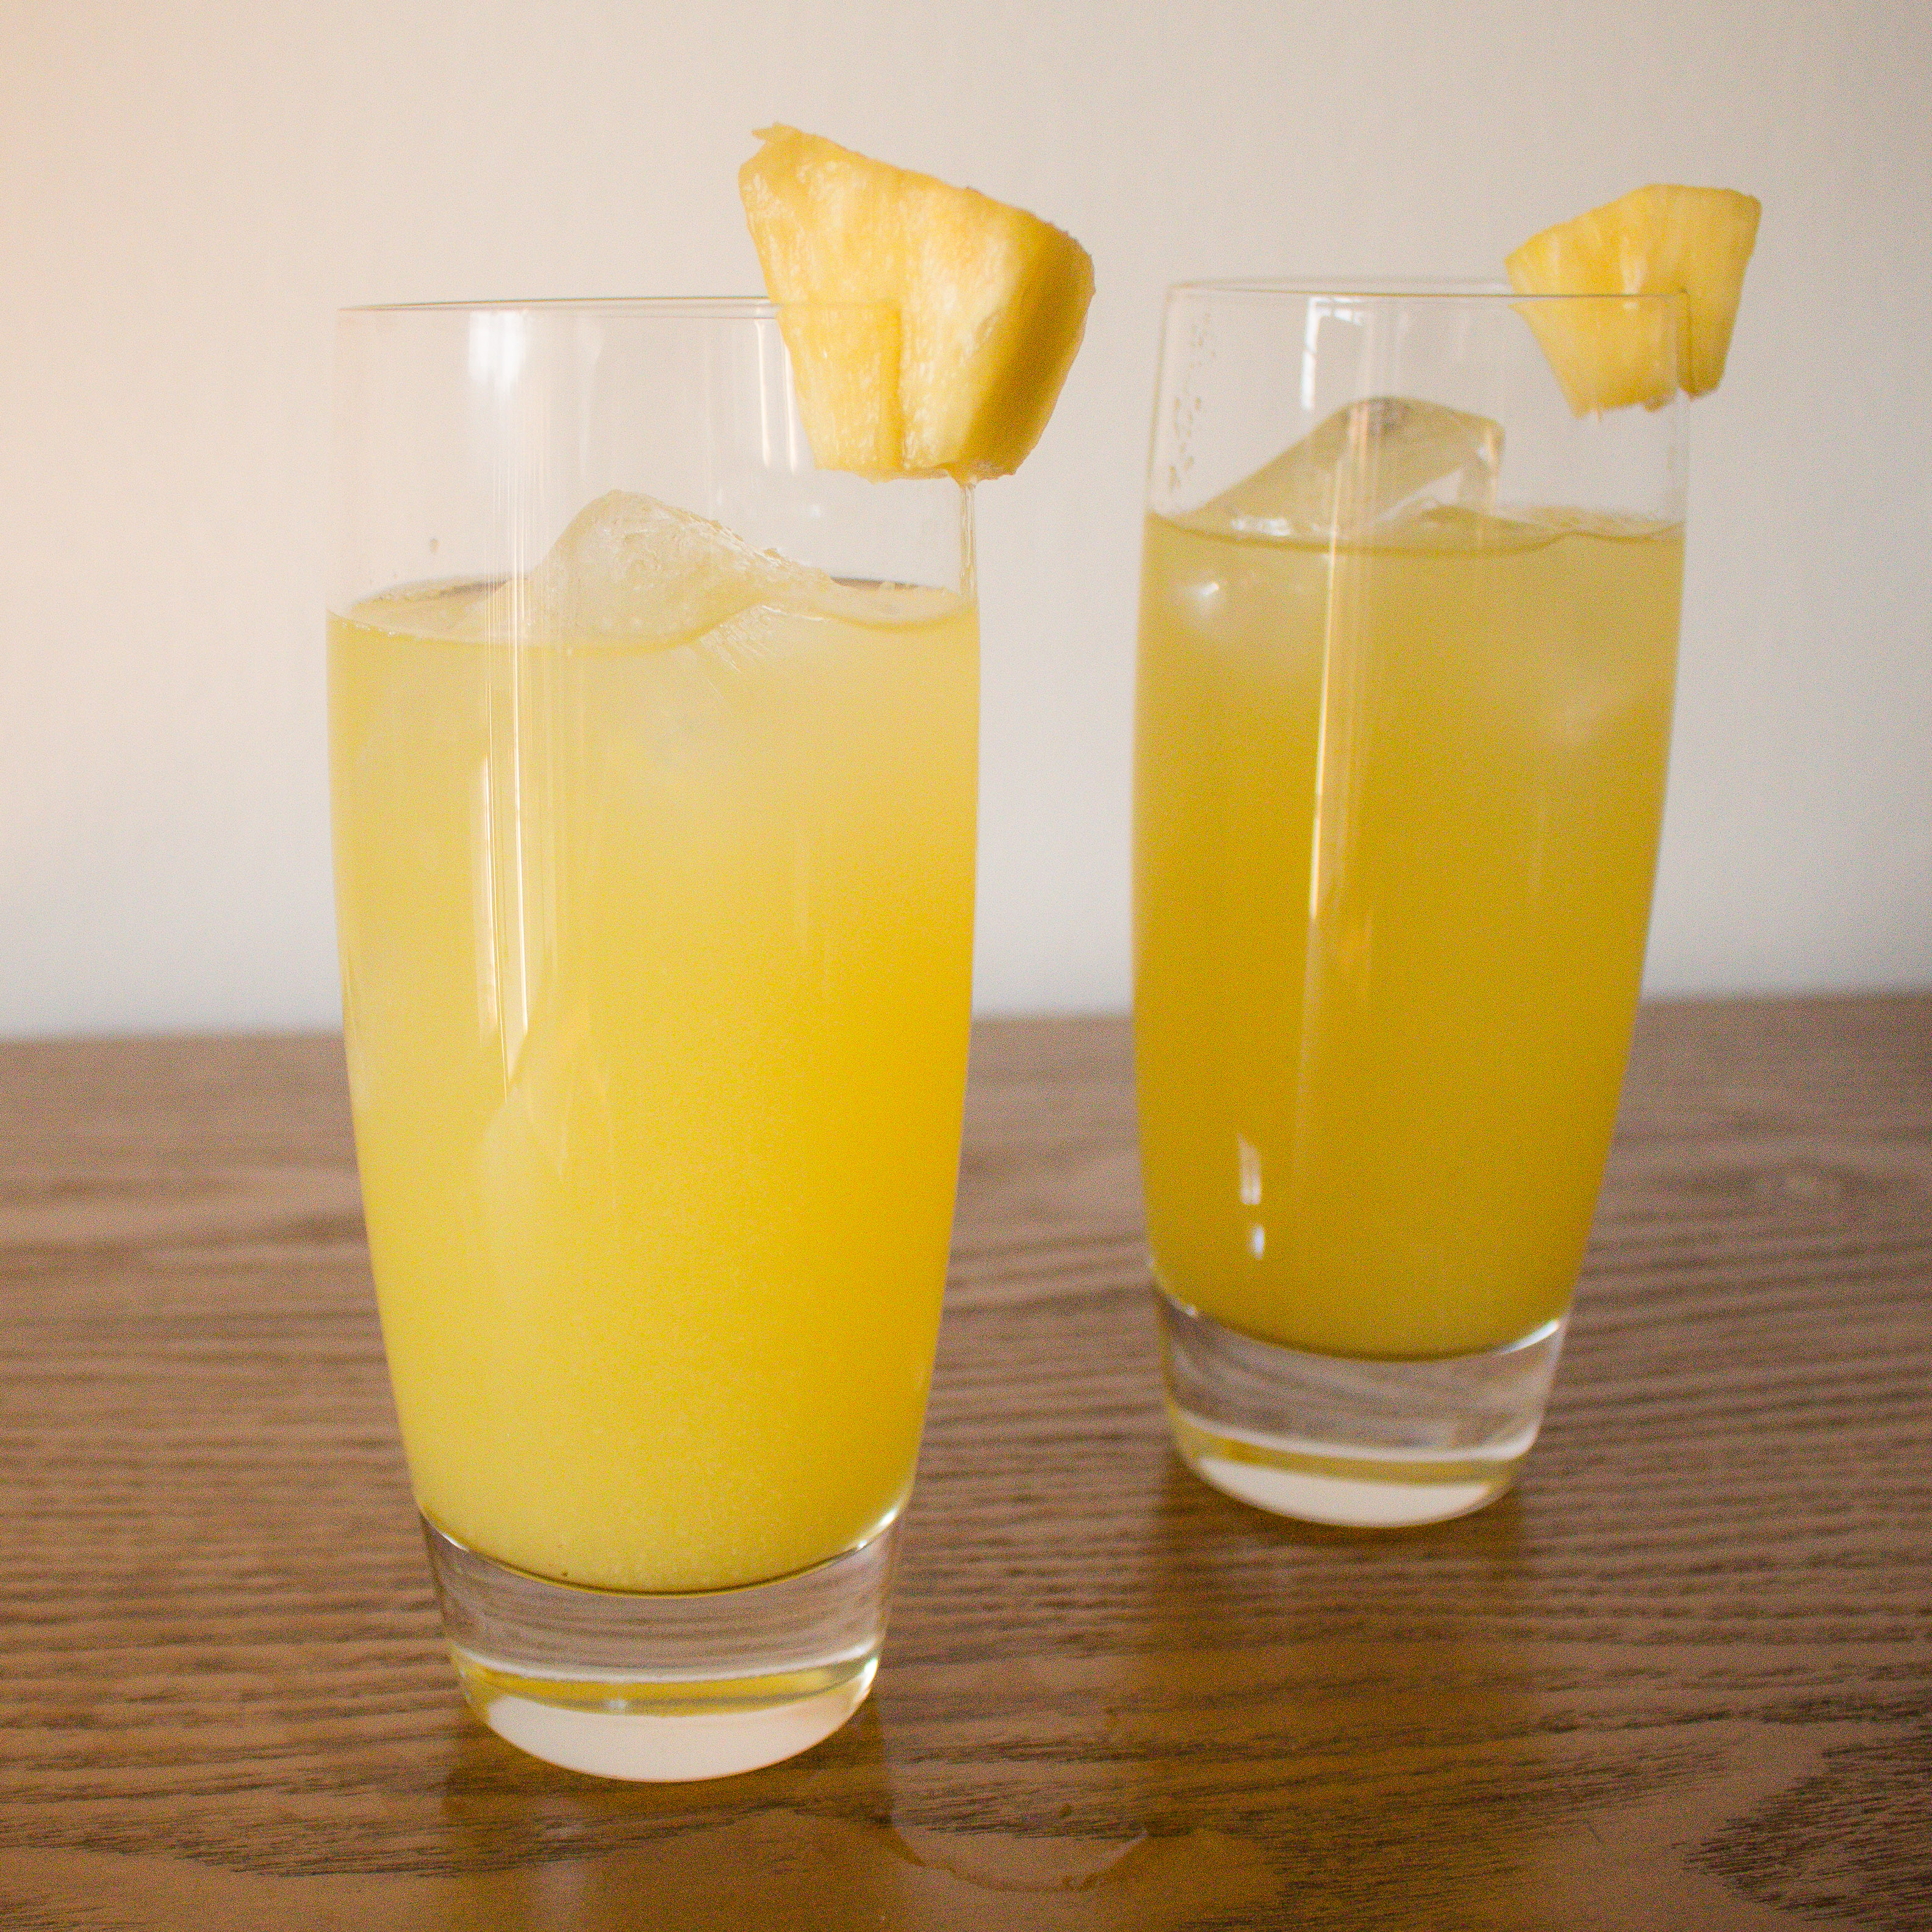 Homemade Pineappleade